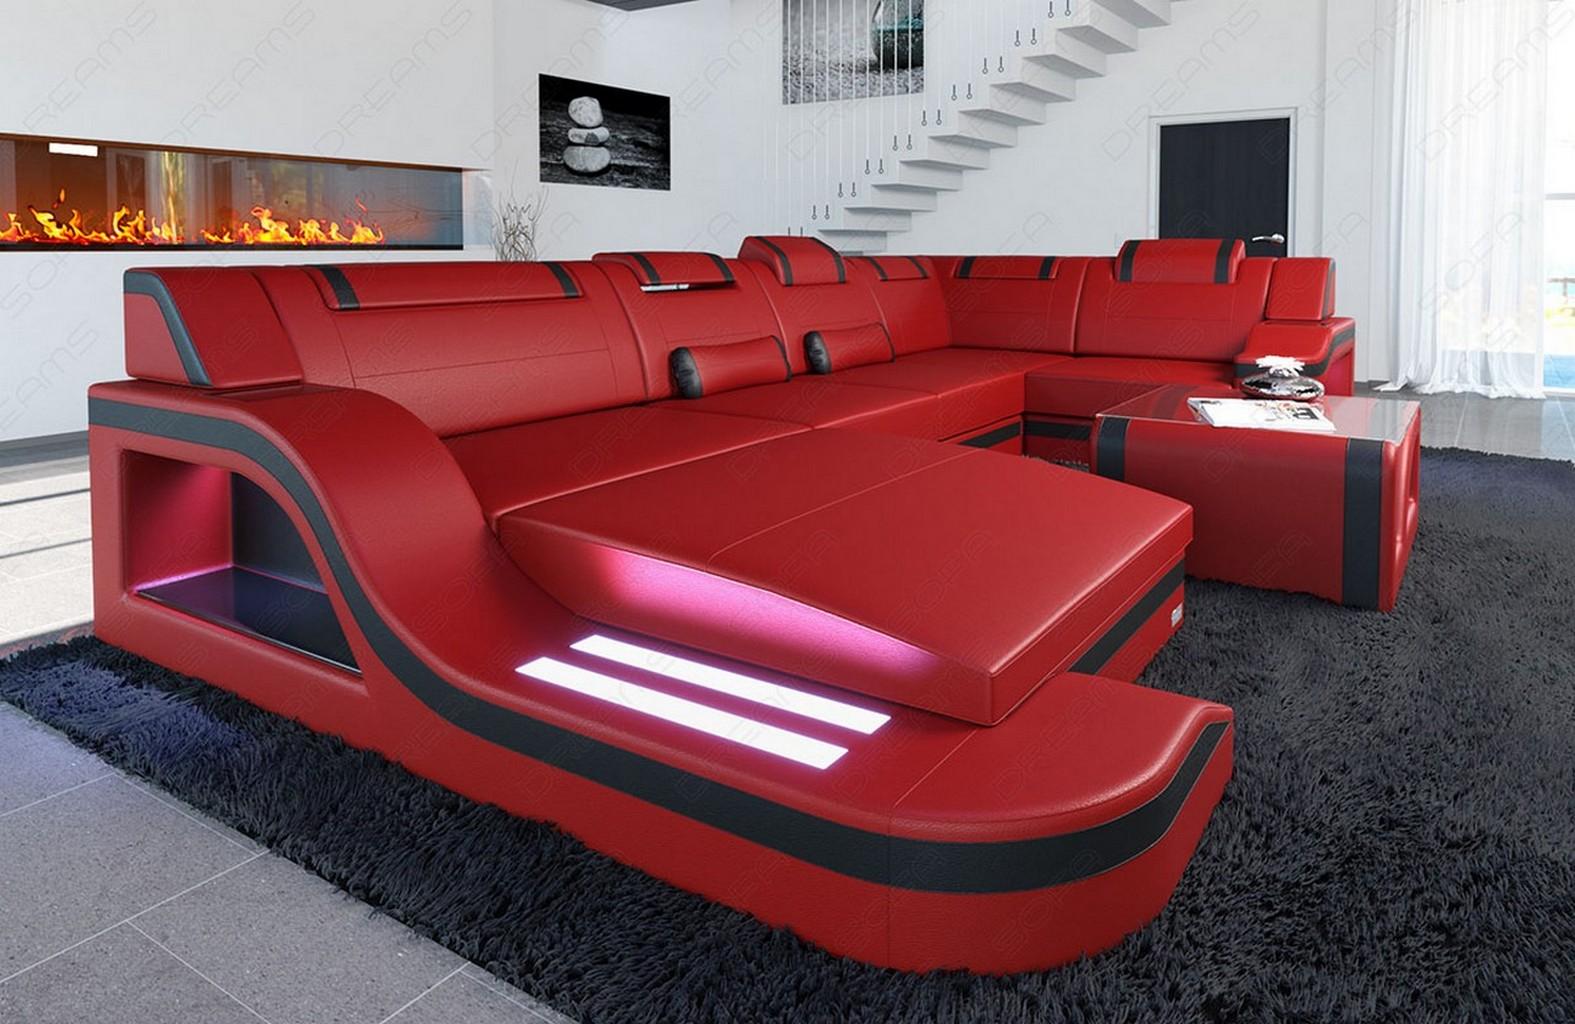 Designsofa palermo in u form mit led beleuchtung mega sofa rot ...